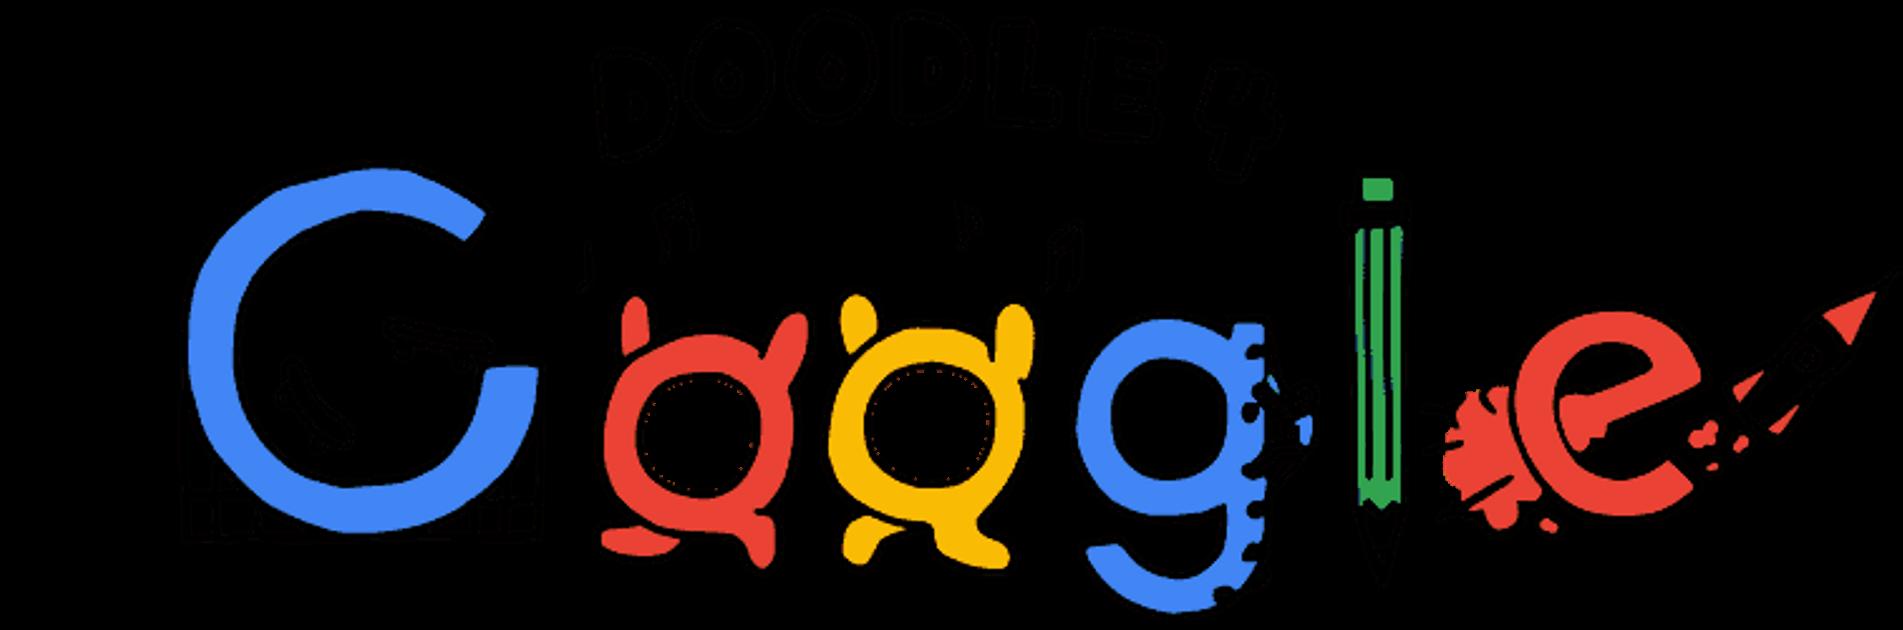 Google logo png 2015.  doodle contest asks